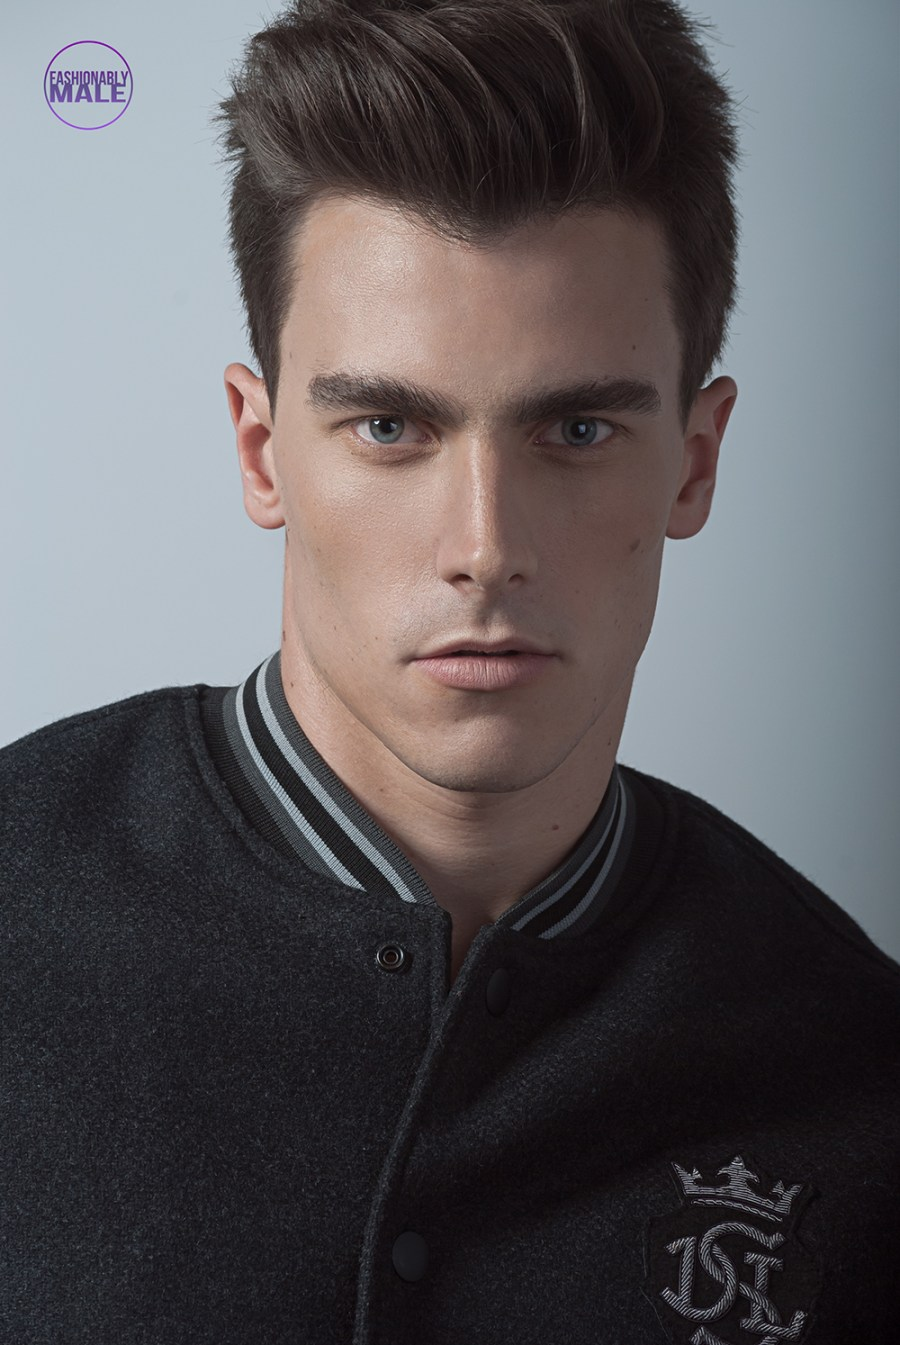 Tomas by Jo Herrera for Fashionably Male13